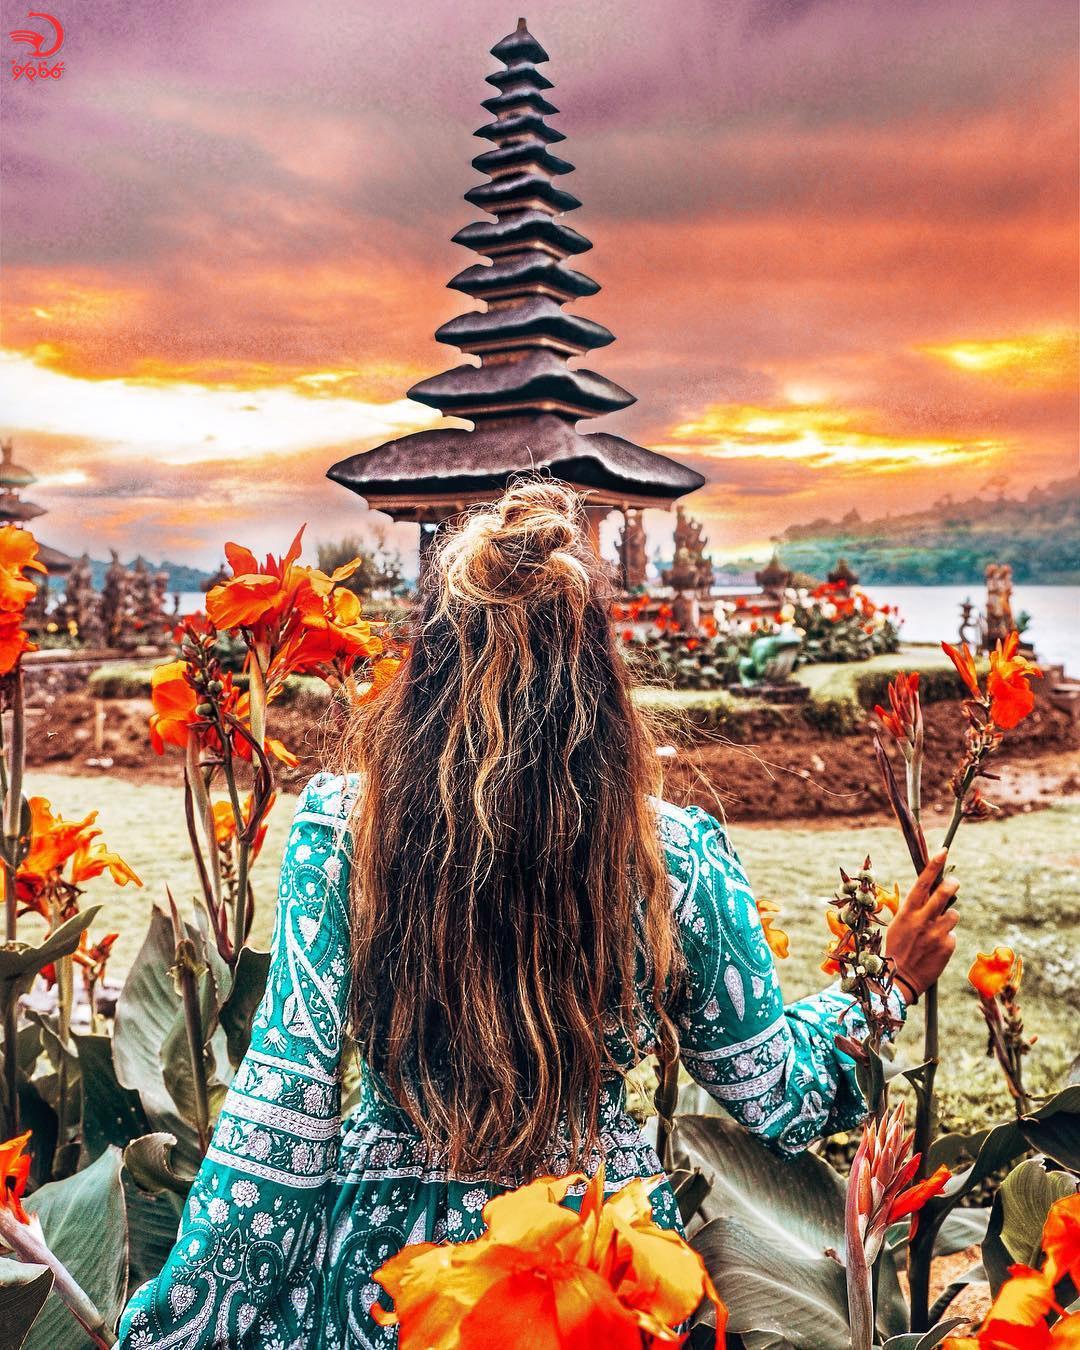 معبد اولون دانو براتان بالی